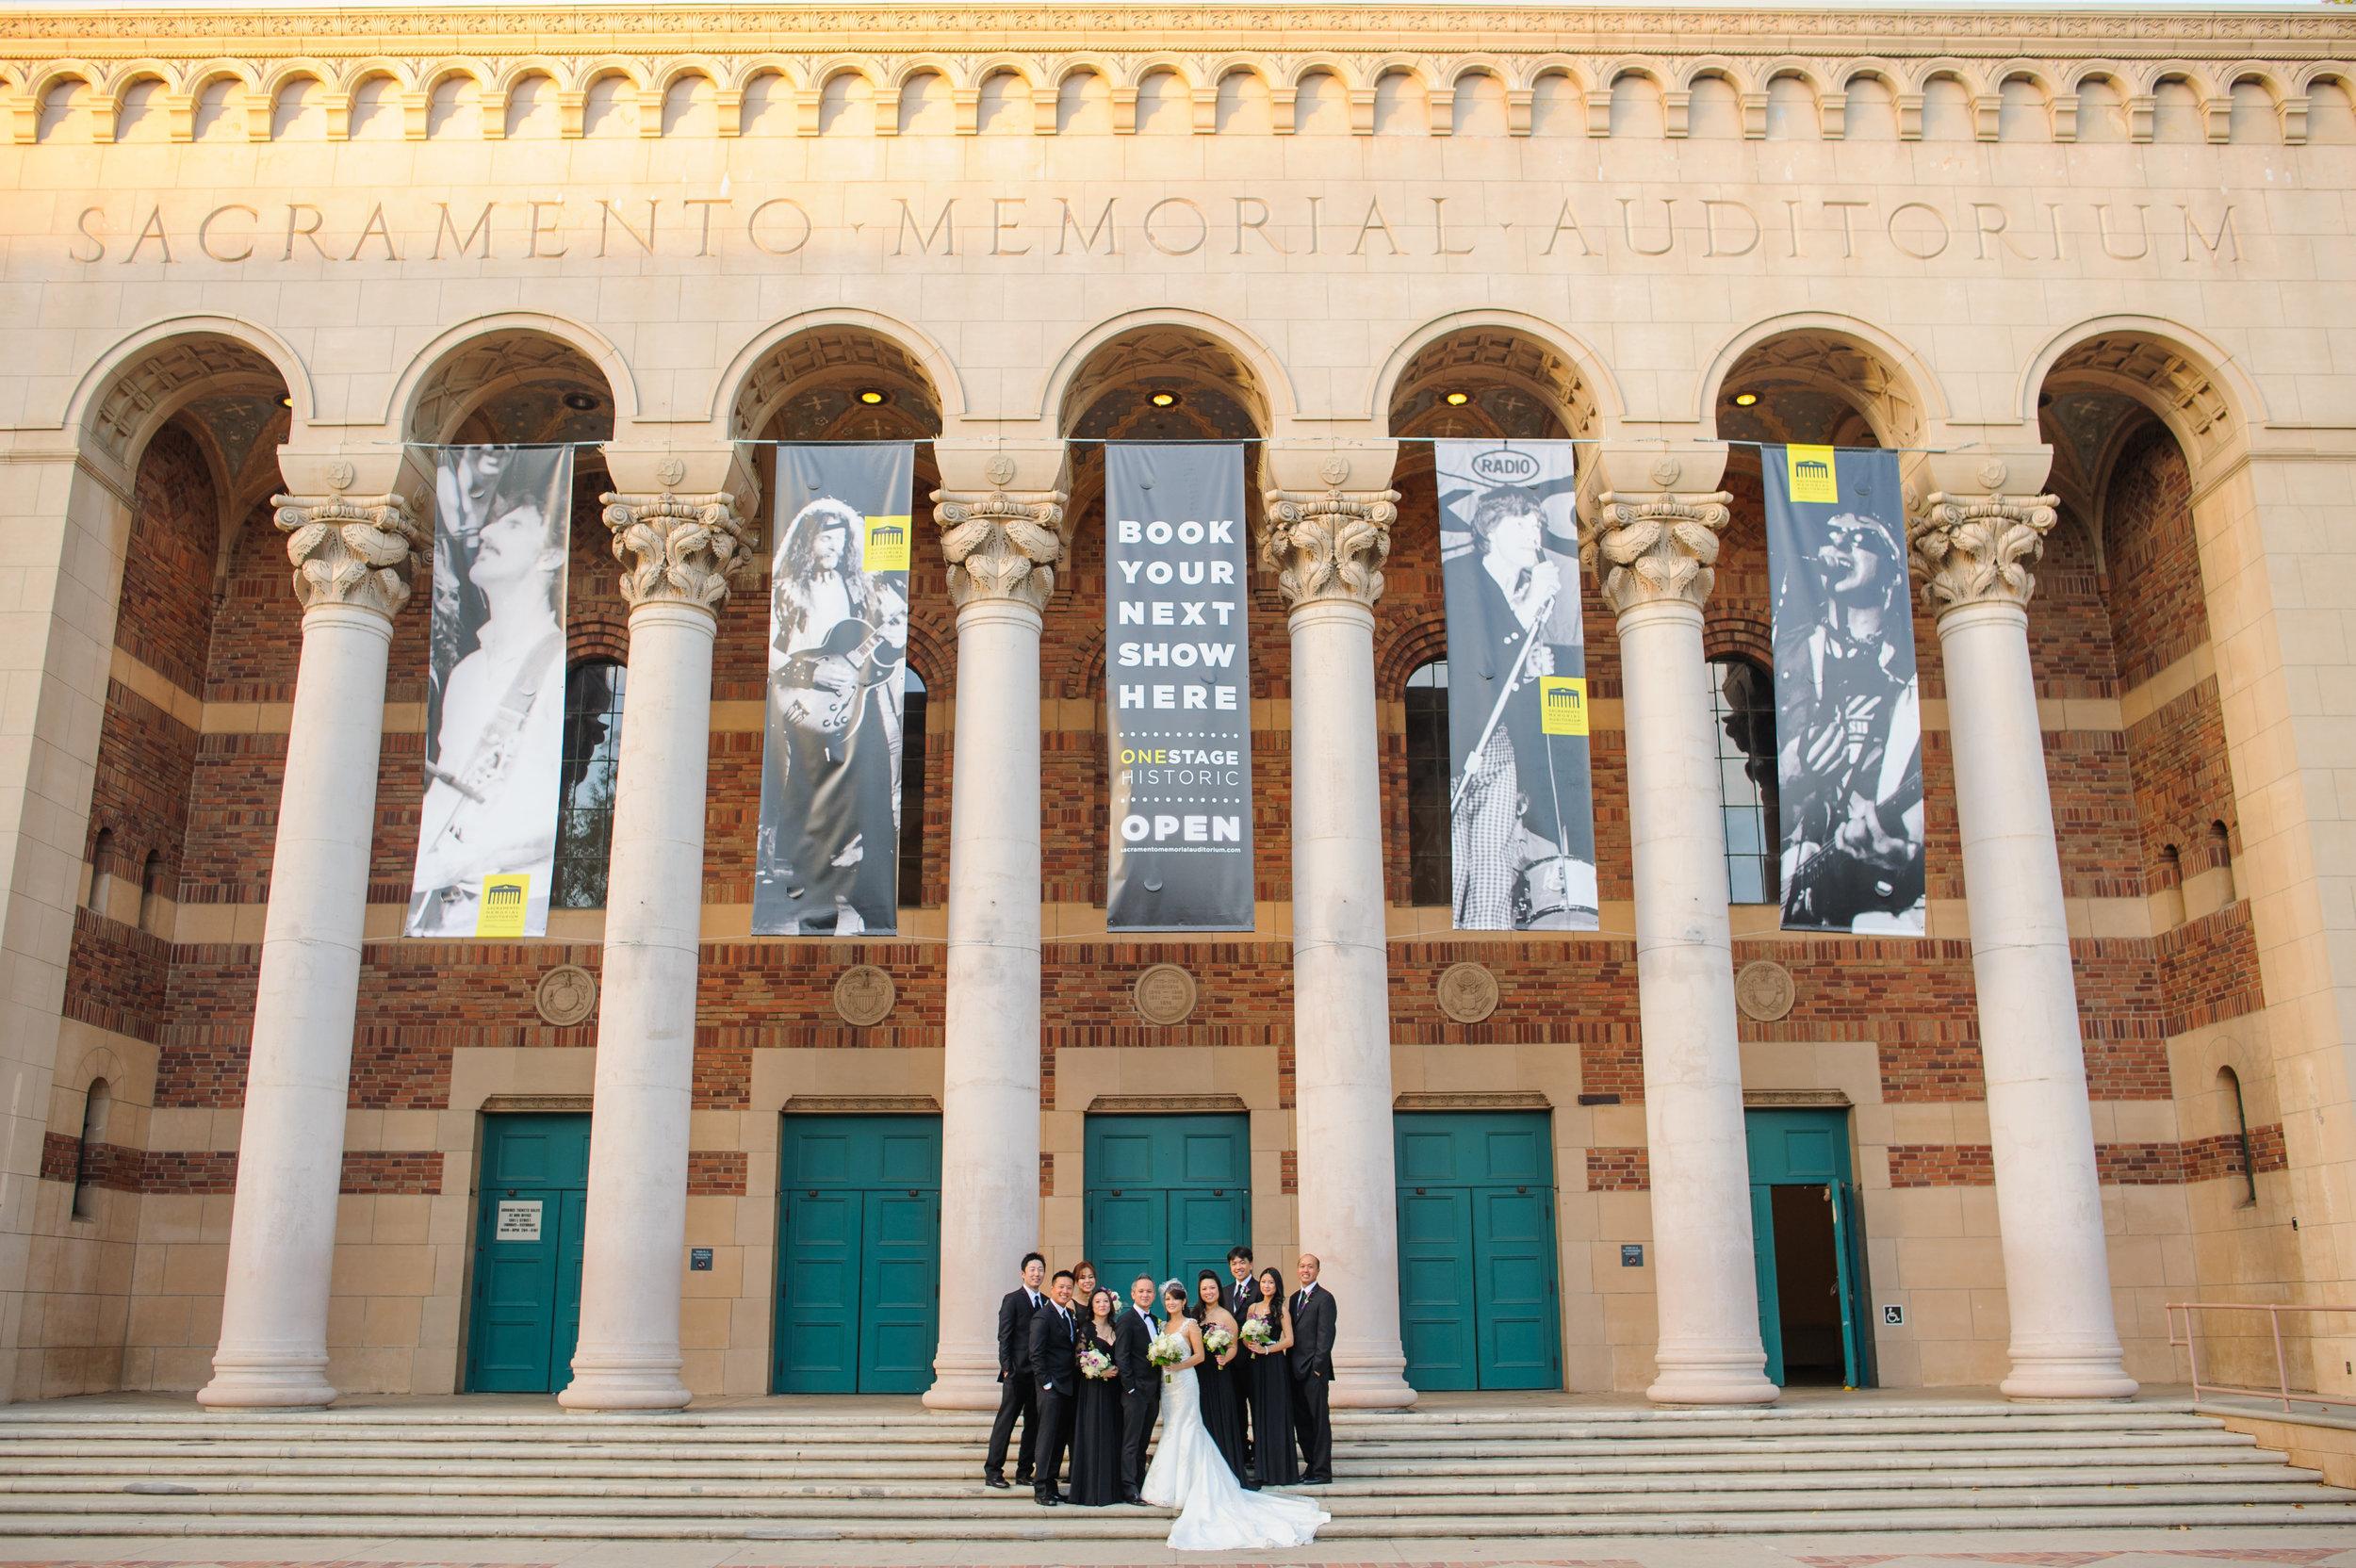 camilla-thuy-063-memorial-auditorium-sacramento-wedding-photographer-katherine-nicole-photography.JPG